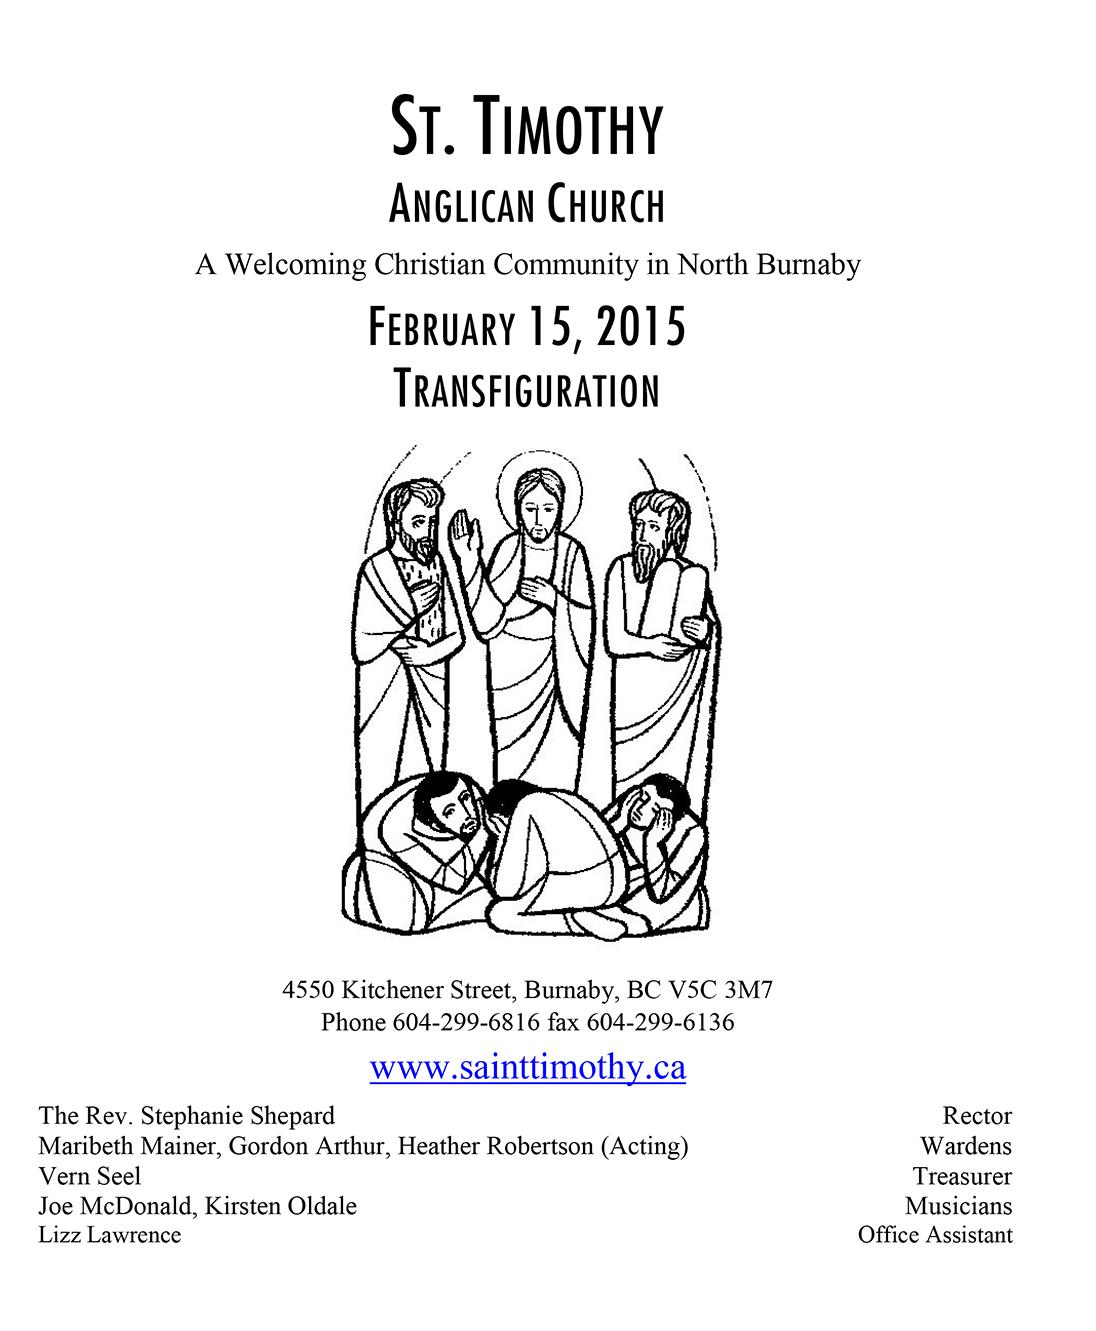 Bulletin: February 15, 2015